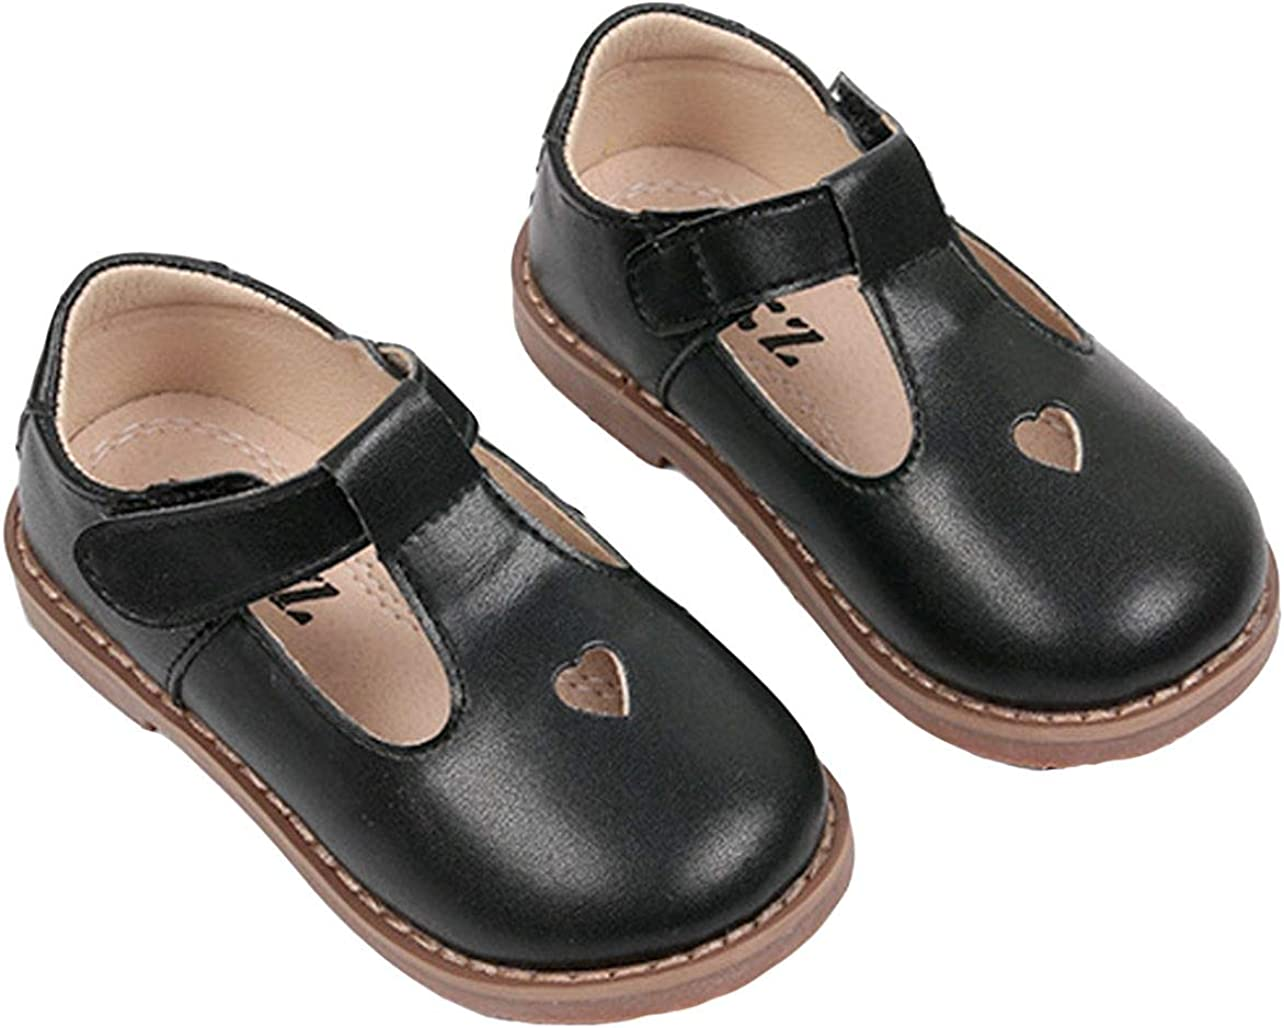 WUIWUIYU Girls Oxfords Shoes T-Strap Casual Walking School Uniform Dress Princess Mary Jane Flats